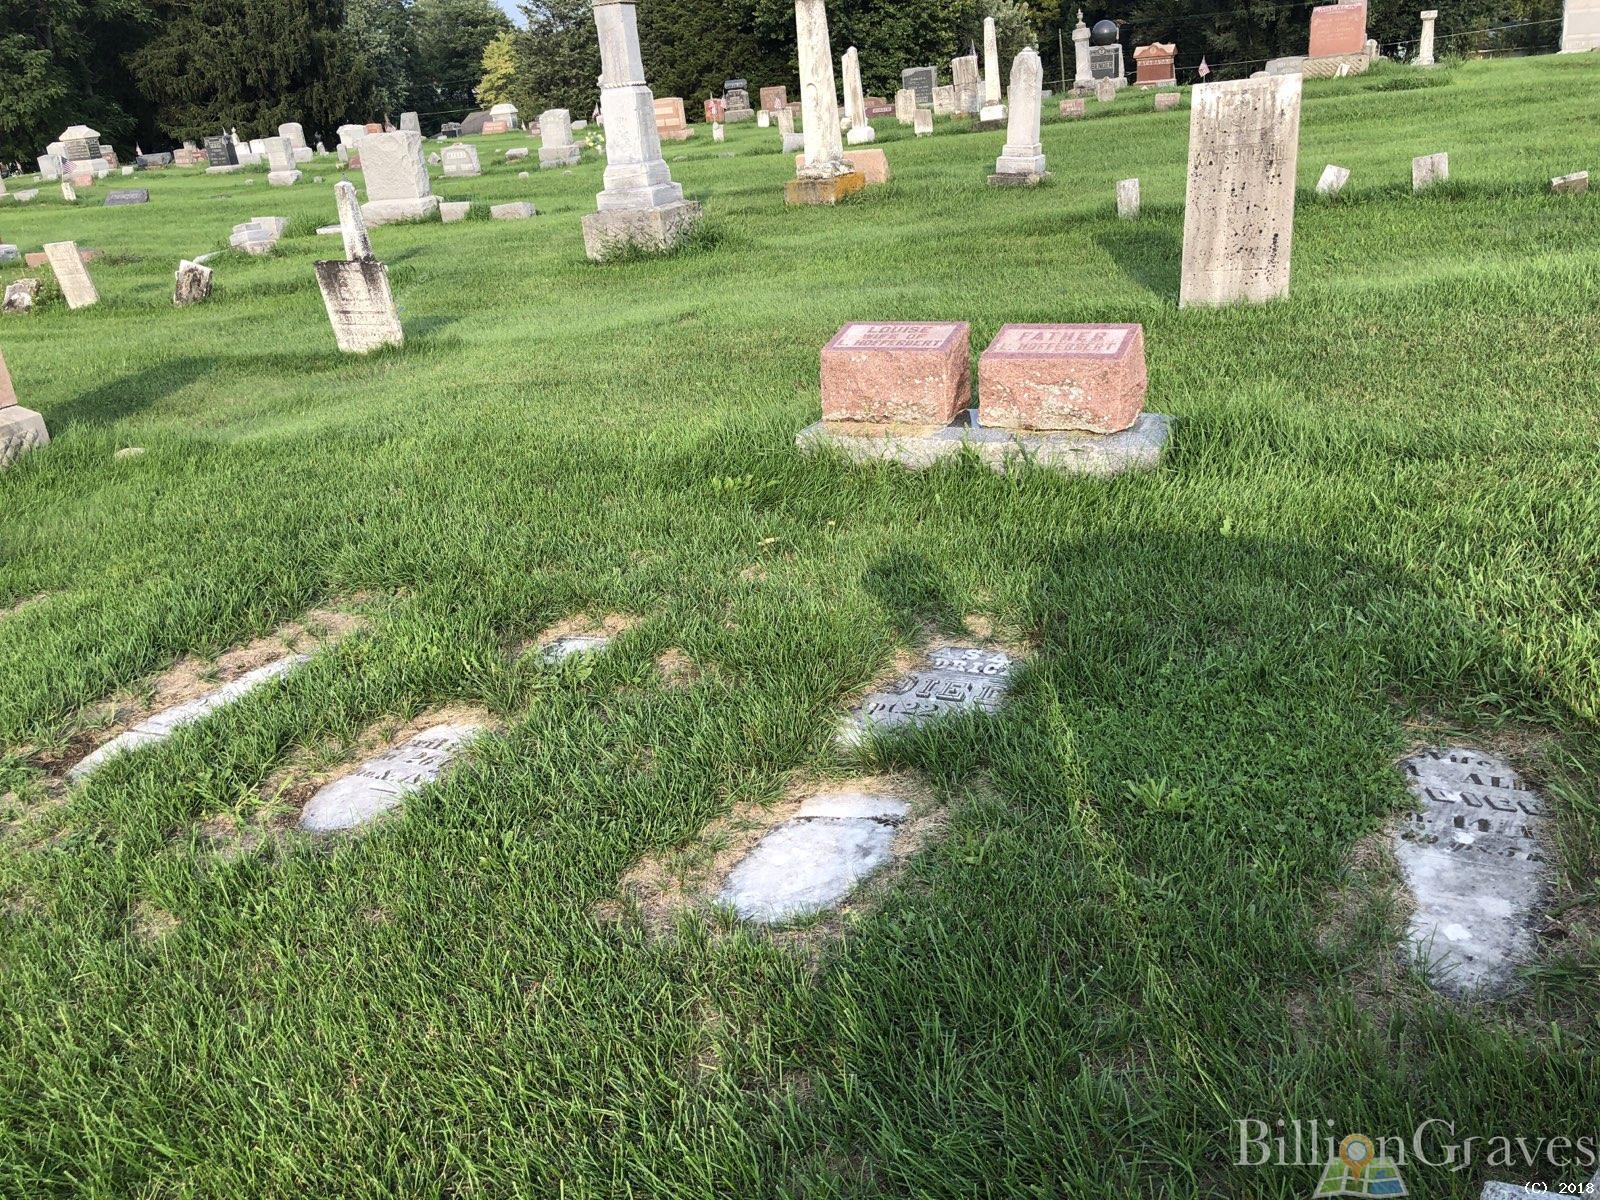 BillionGraves, gravestone, grave, damaged gravestones, cemetery, family history, ancestors, community service project, JustServe, Hamilton, Indiana, BillionGraves app